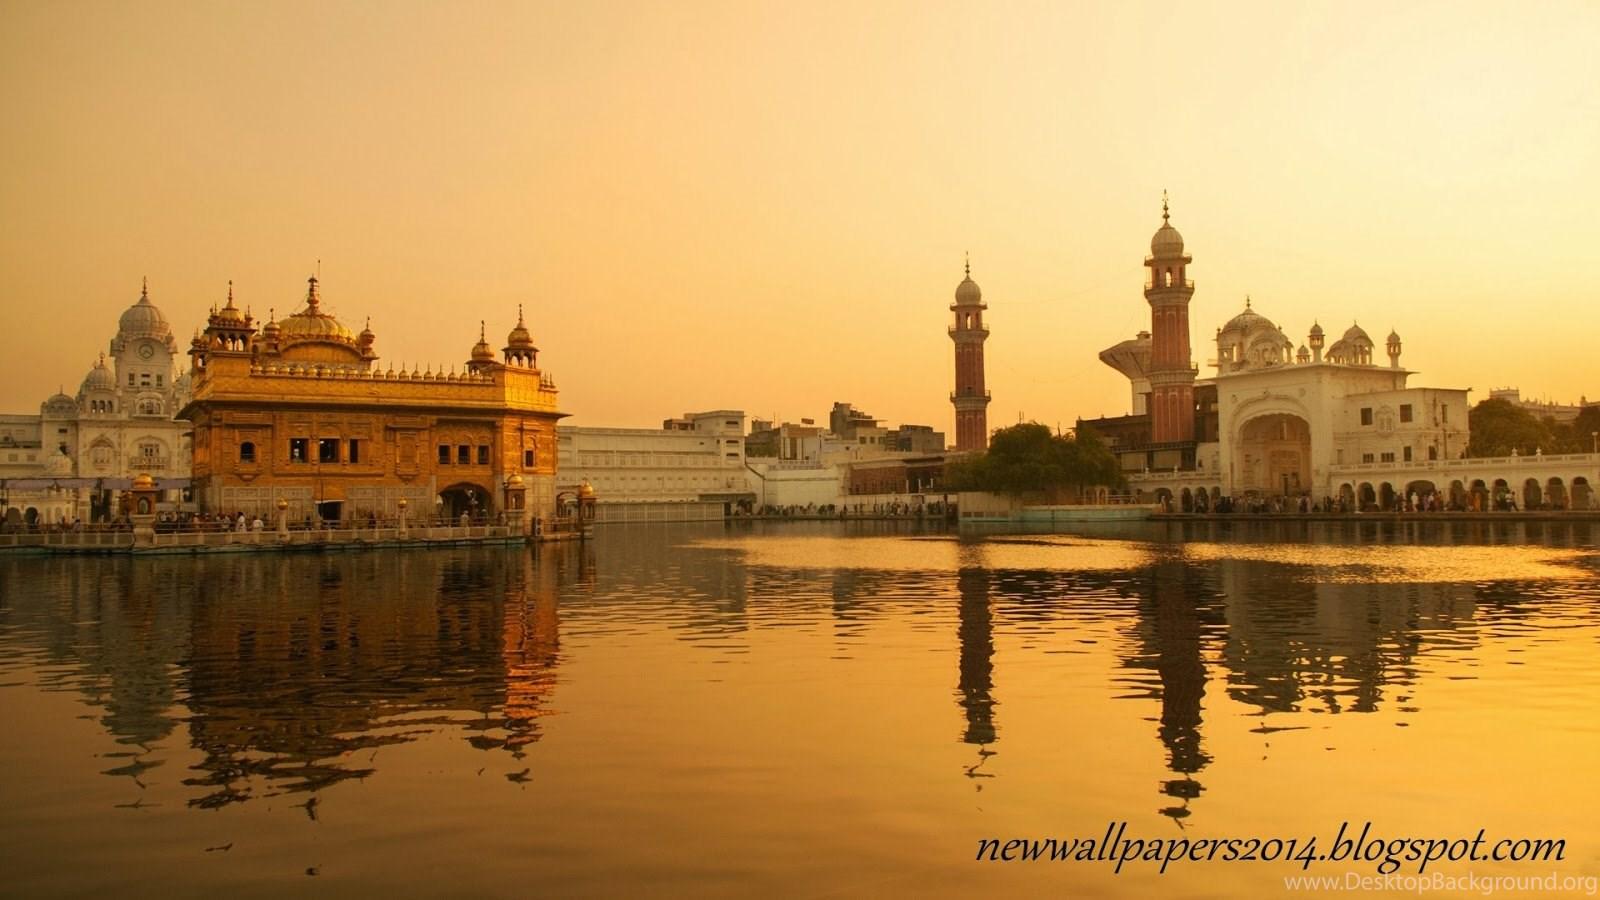 the golden temple harmandir sahib hd wallpapers 2014 hd  desktop